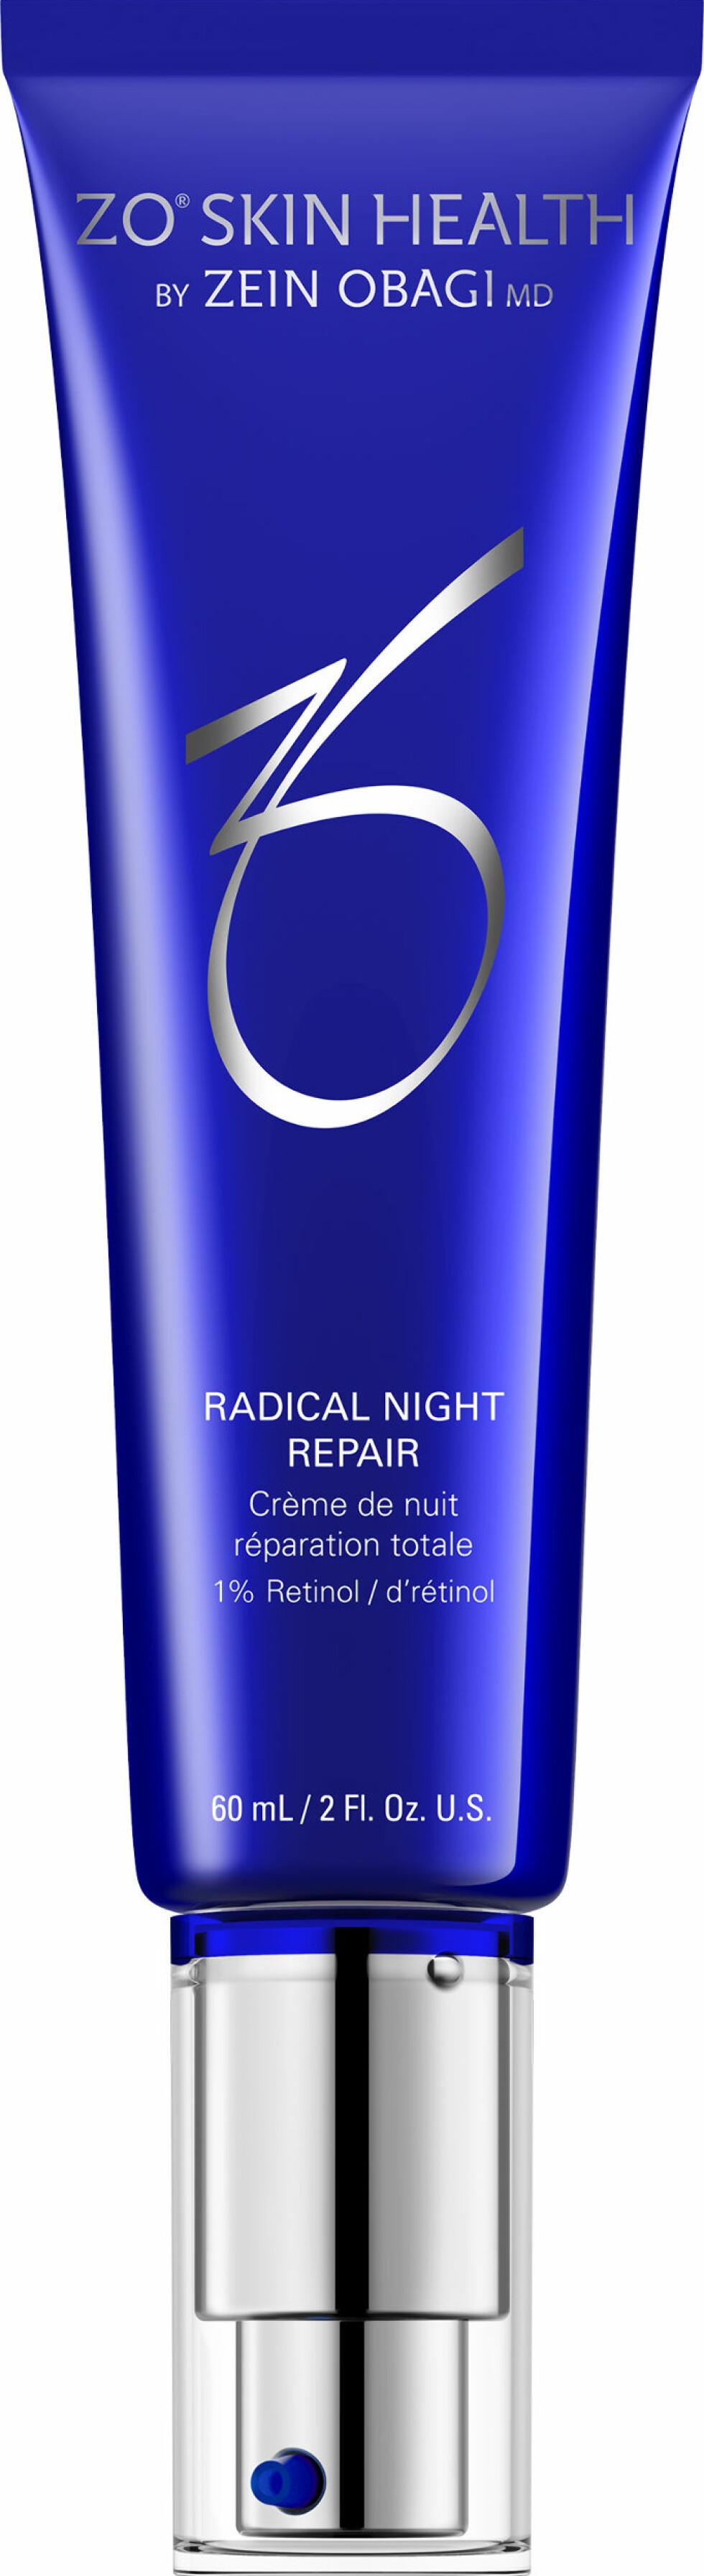 Ganske høy dose med retinol/vitamin A (kr 2335, Zo Skin Health, Radical Night Repair).